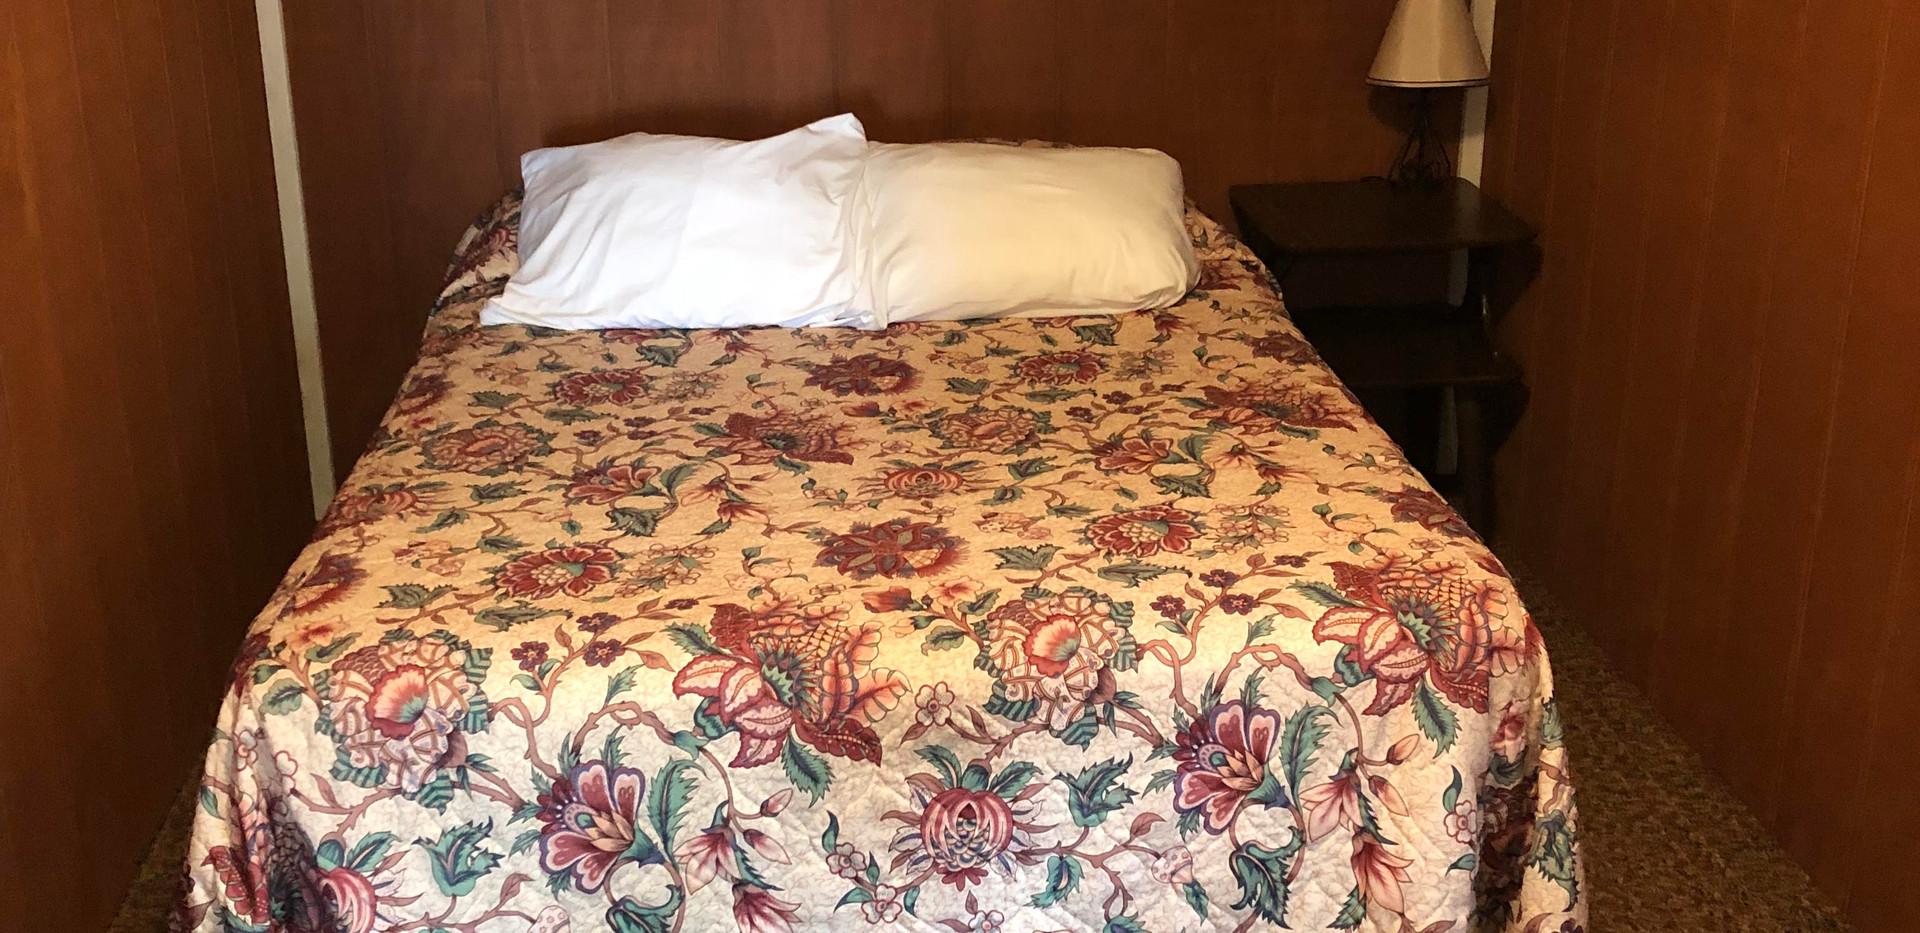 cab 4 beds.jpg